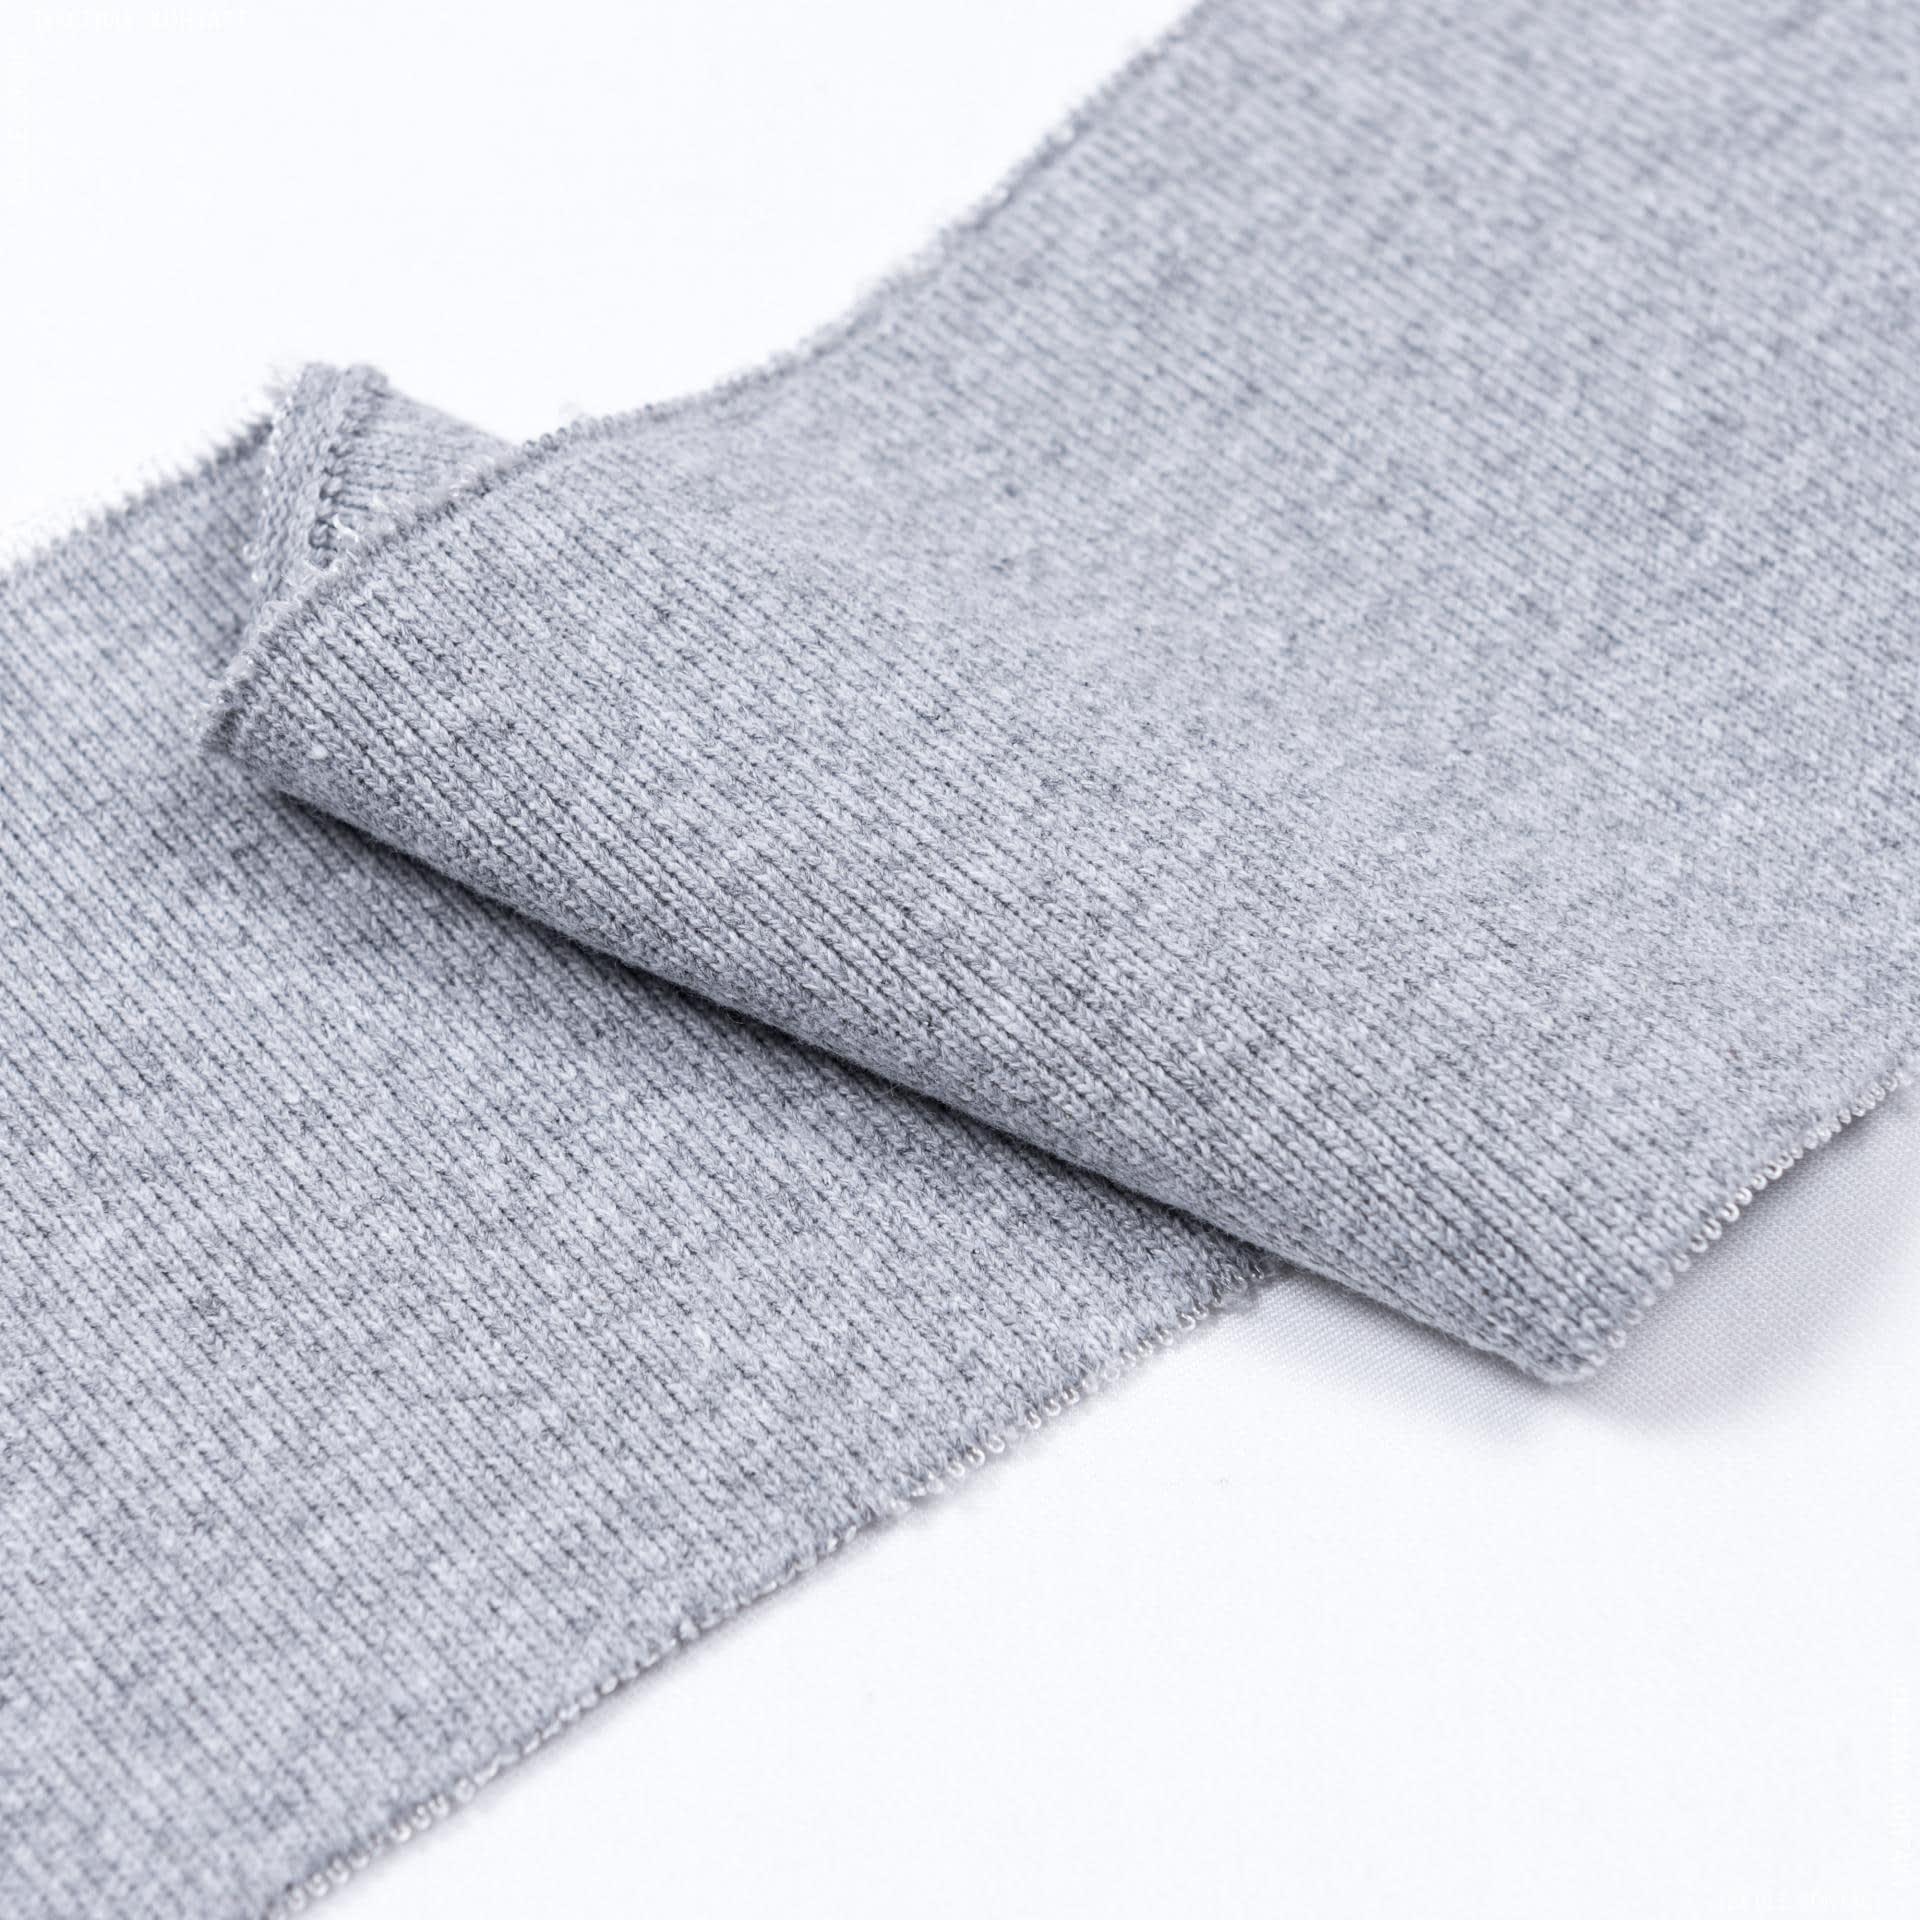 Ткани трикотаж - Воротник- манжет  серый/меланж   10 х 42